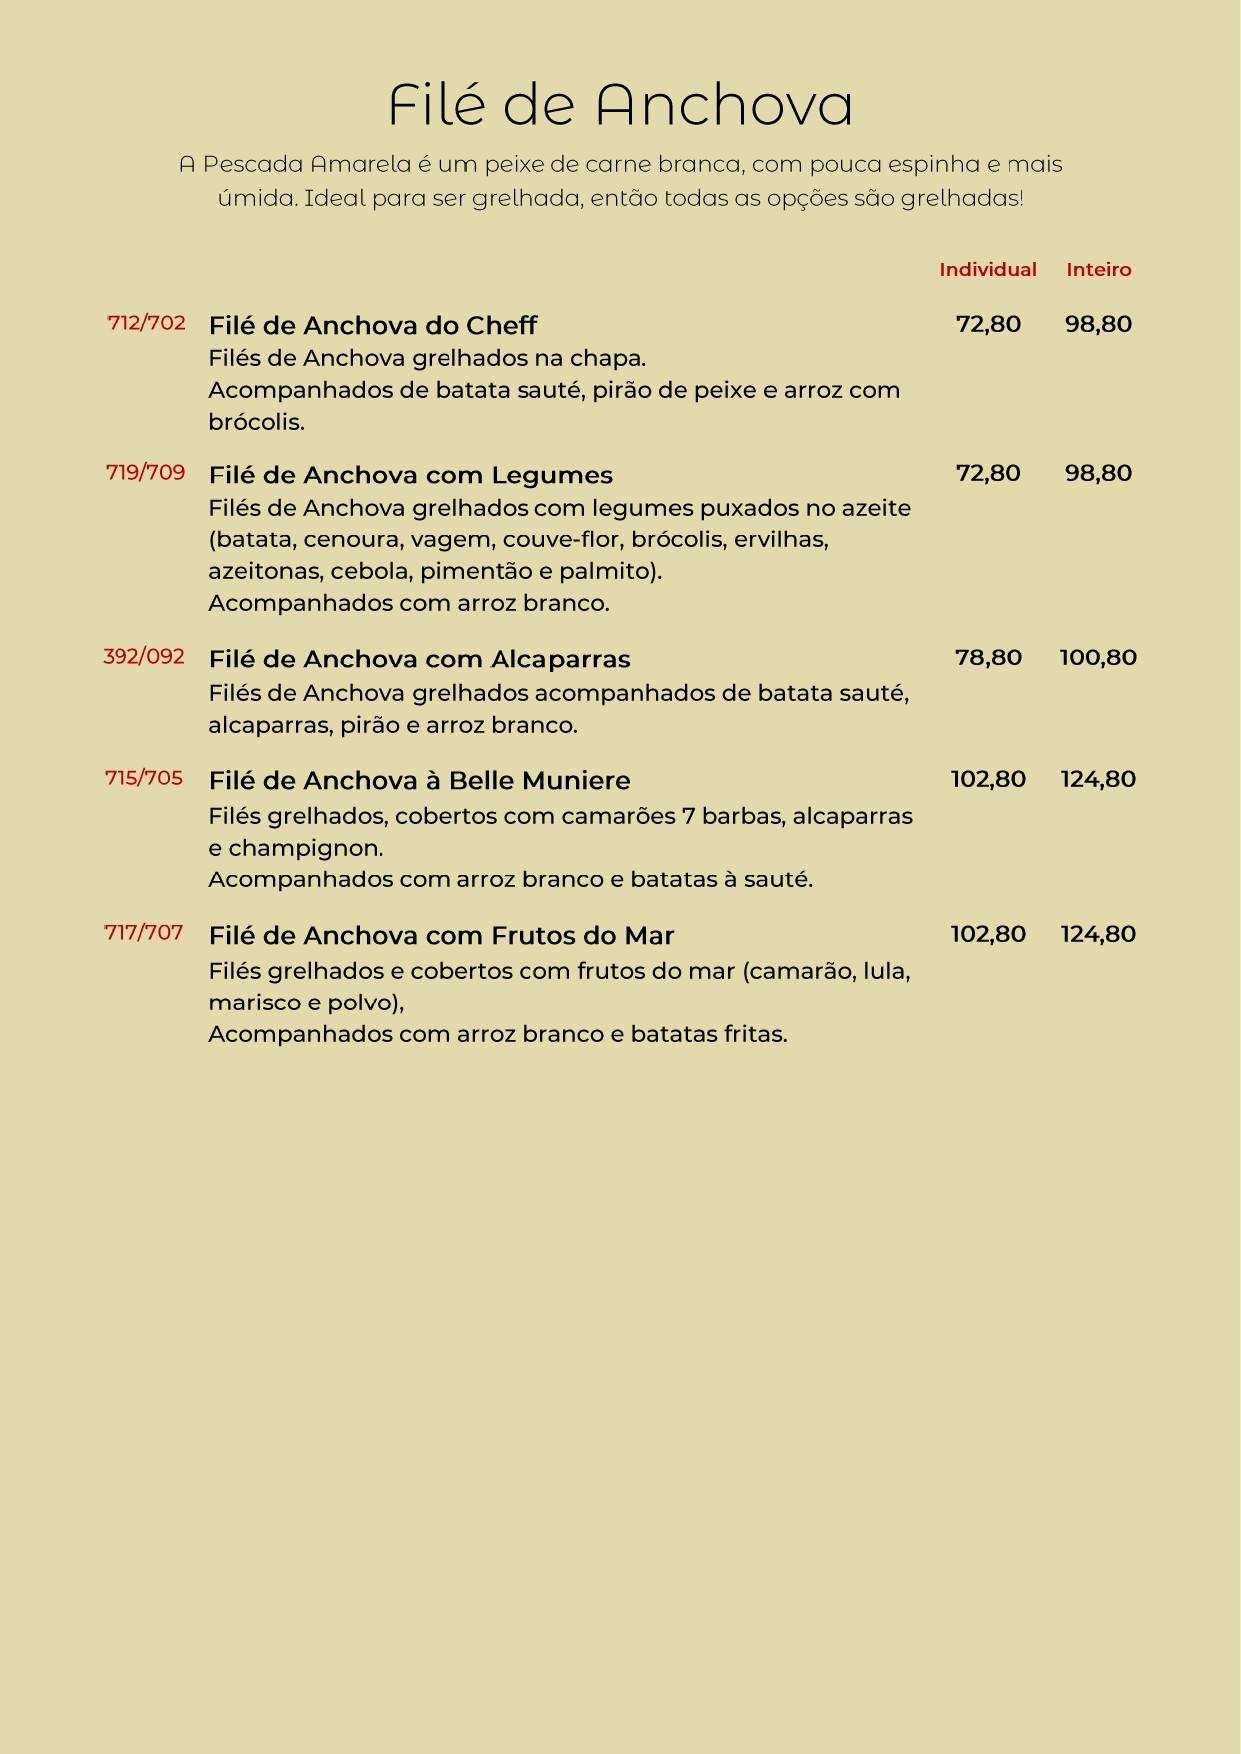 Cardápio Digital_page-0009.jpg